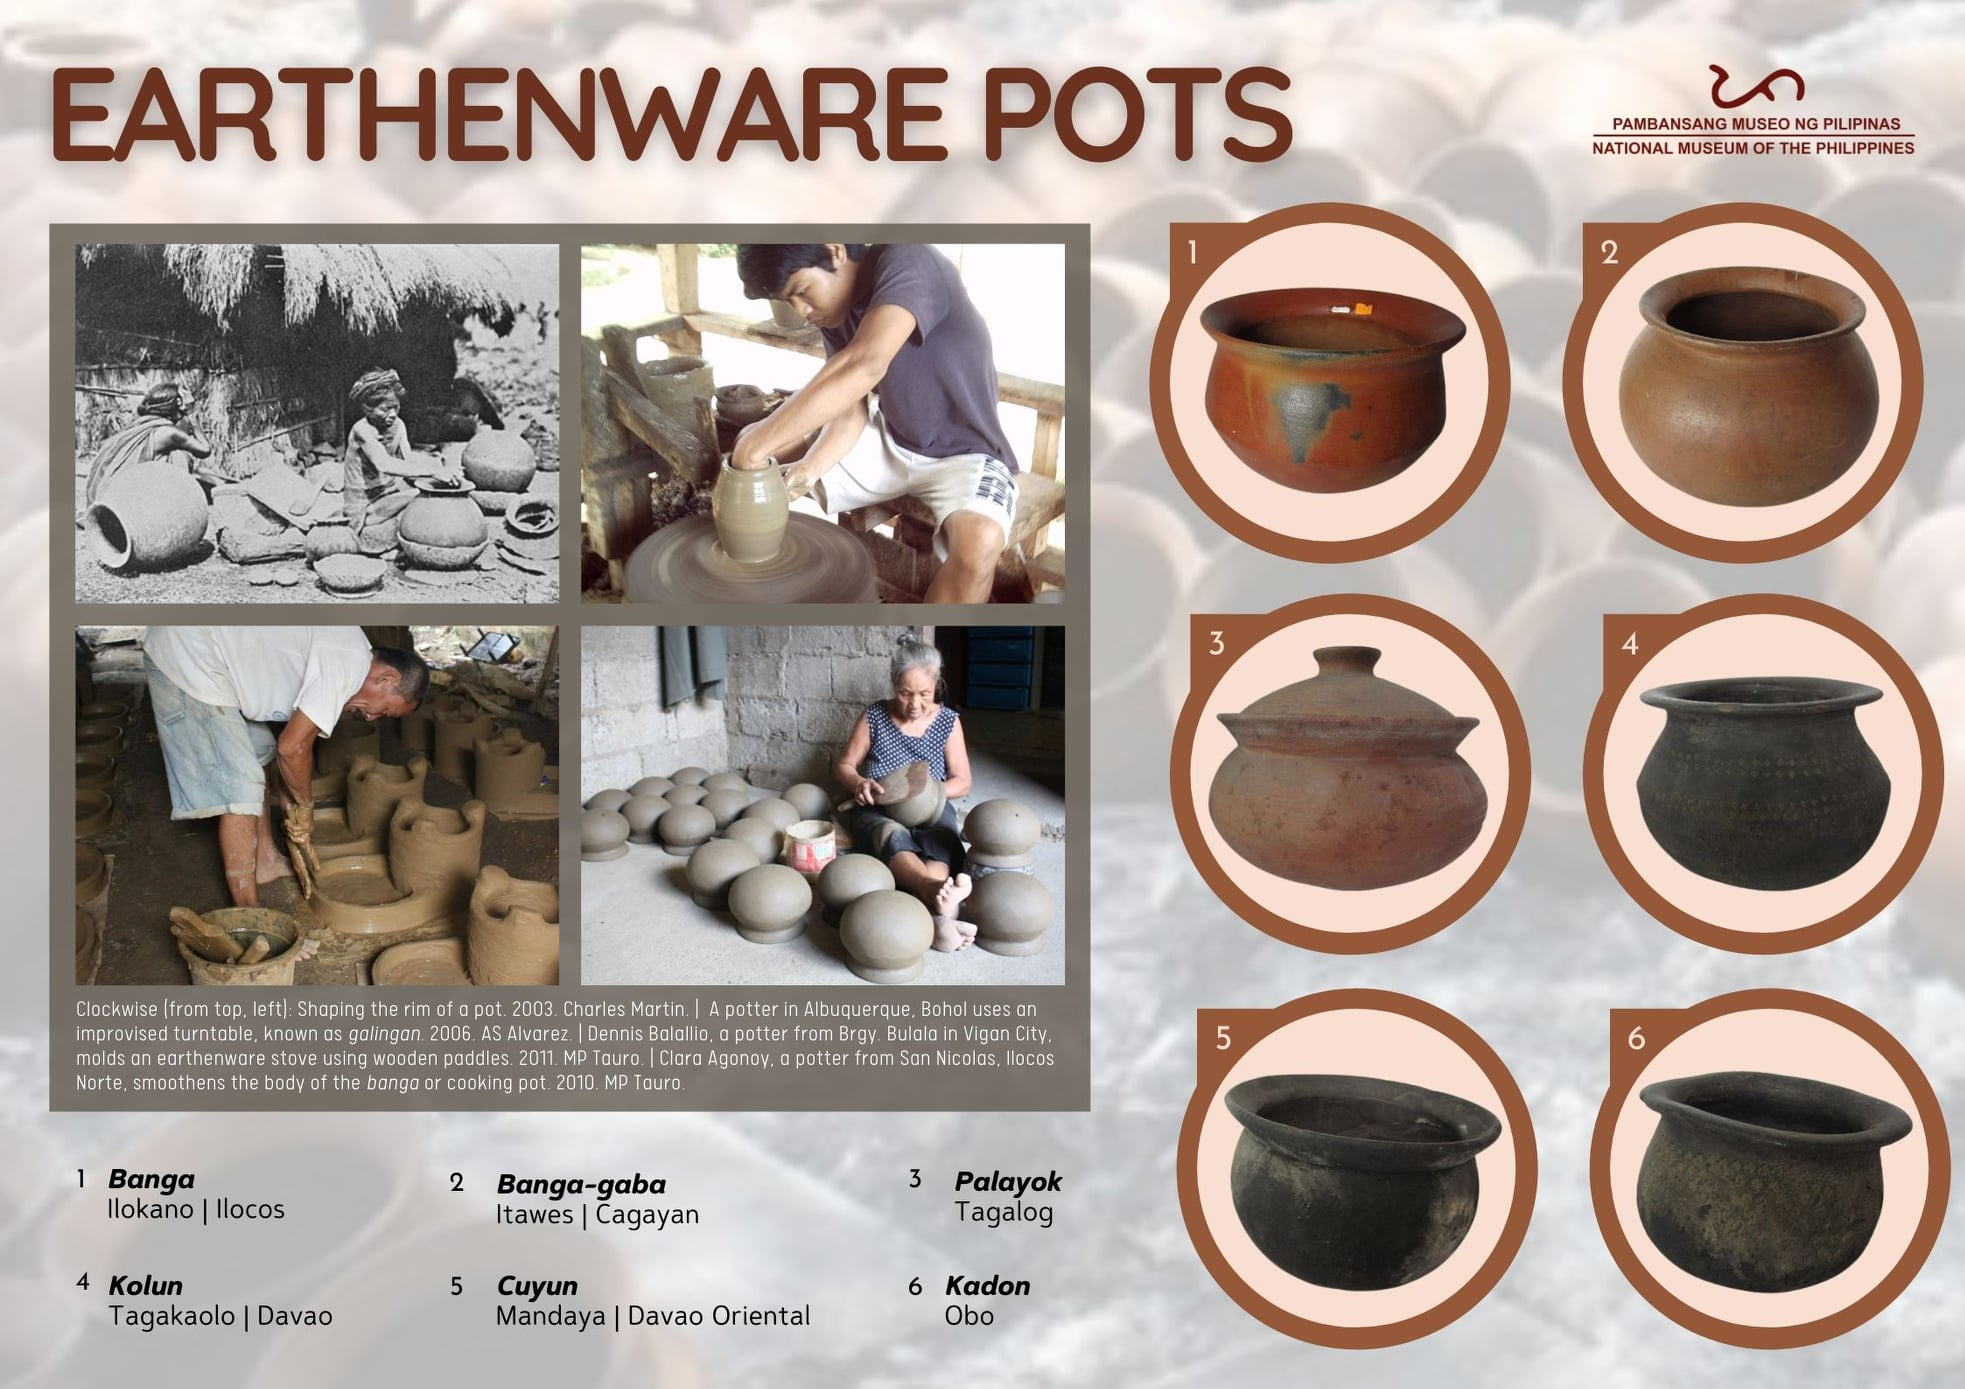 Earthenware pots (palayok in Tagalog, banga/tayab in Ilokano, kolun in Bisaya, kurey in Teduray)